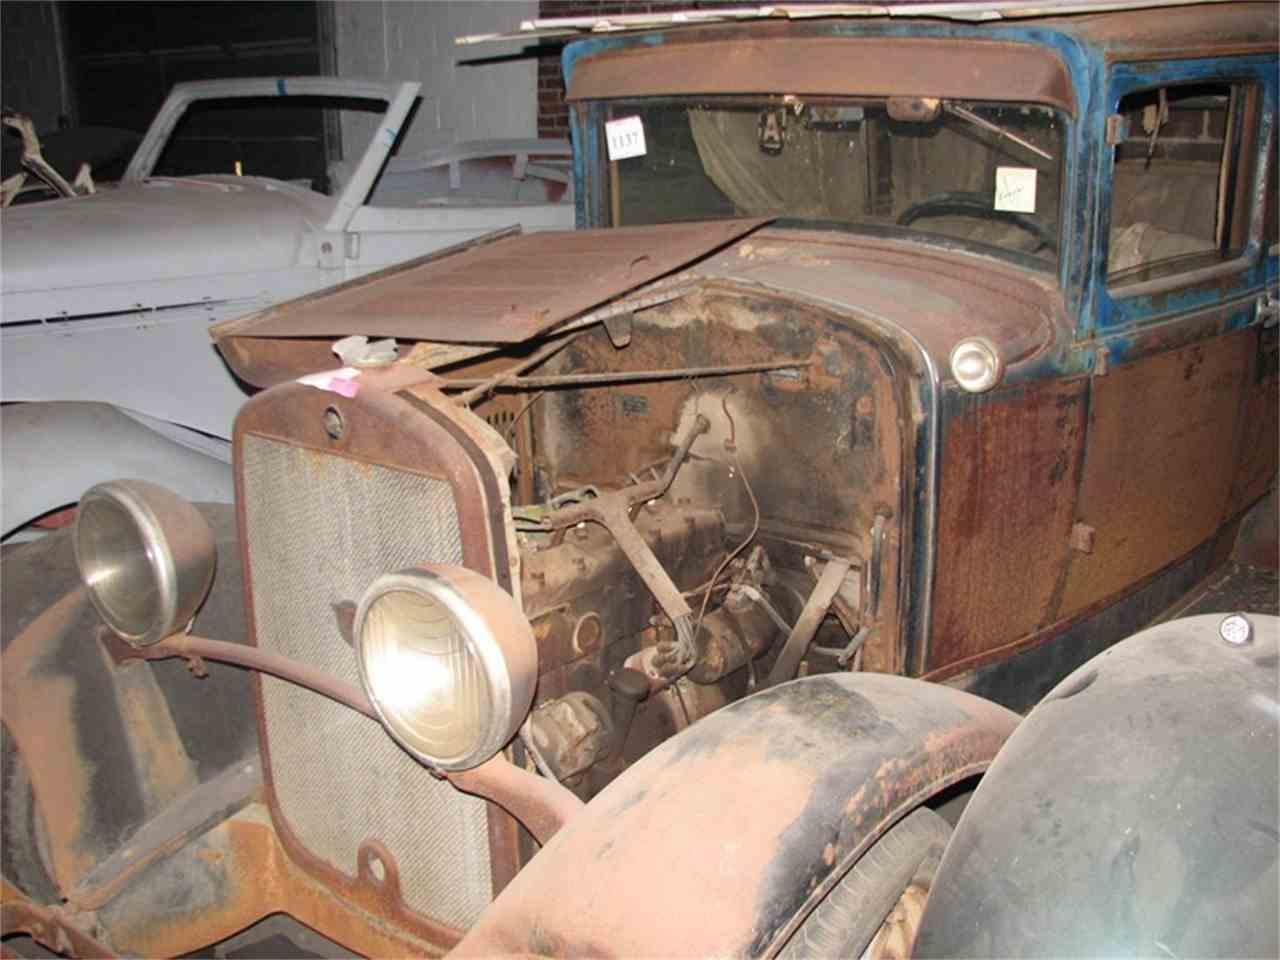 1926 Chrysler 4-Dr Sedan for Sale | ClassicCars.com | CC-1036381